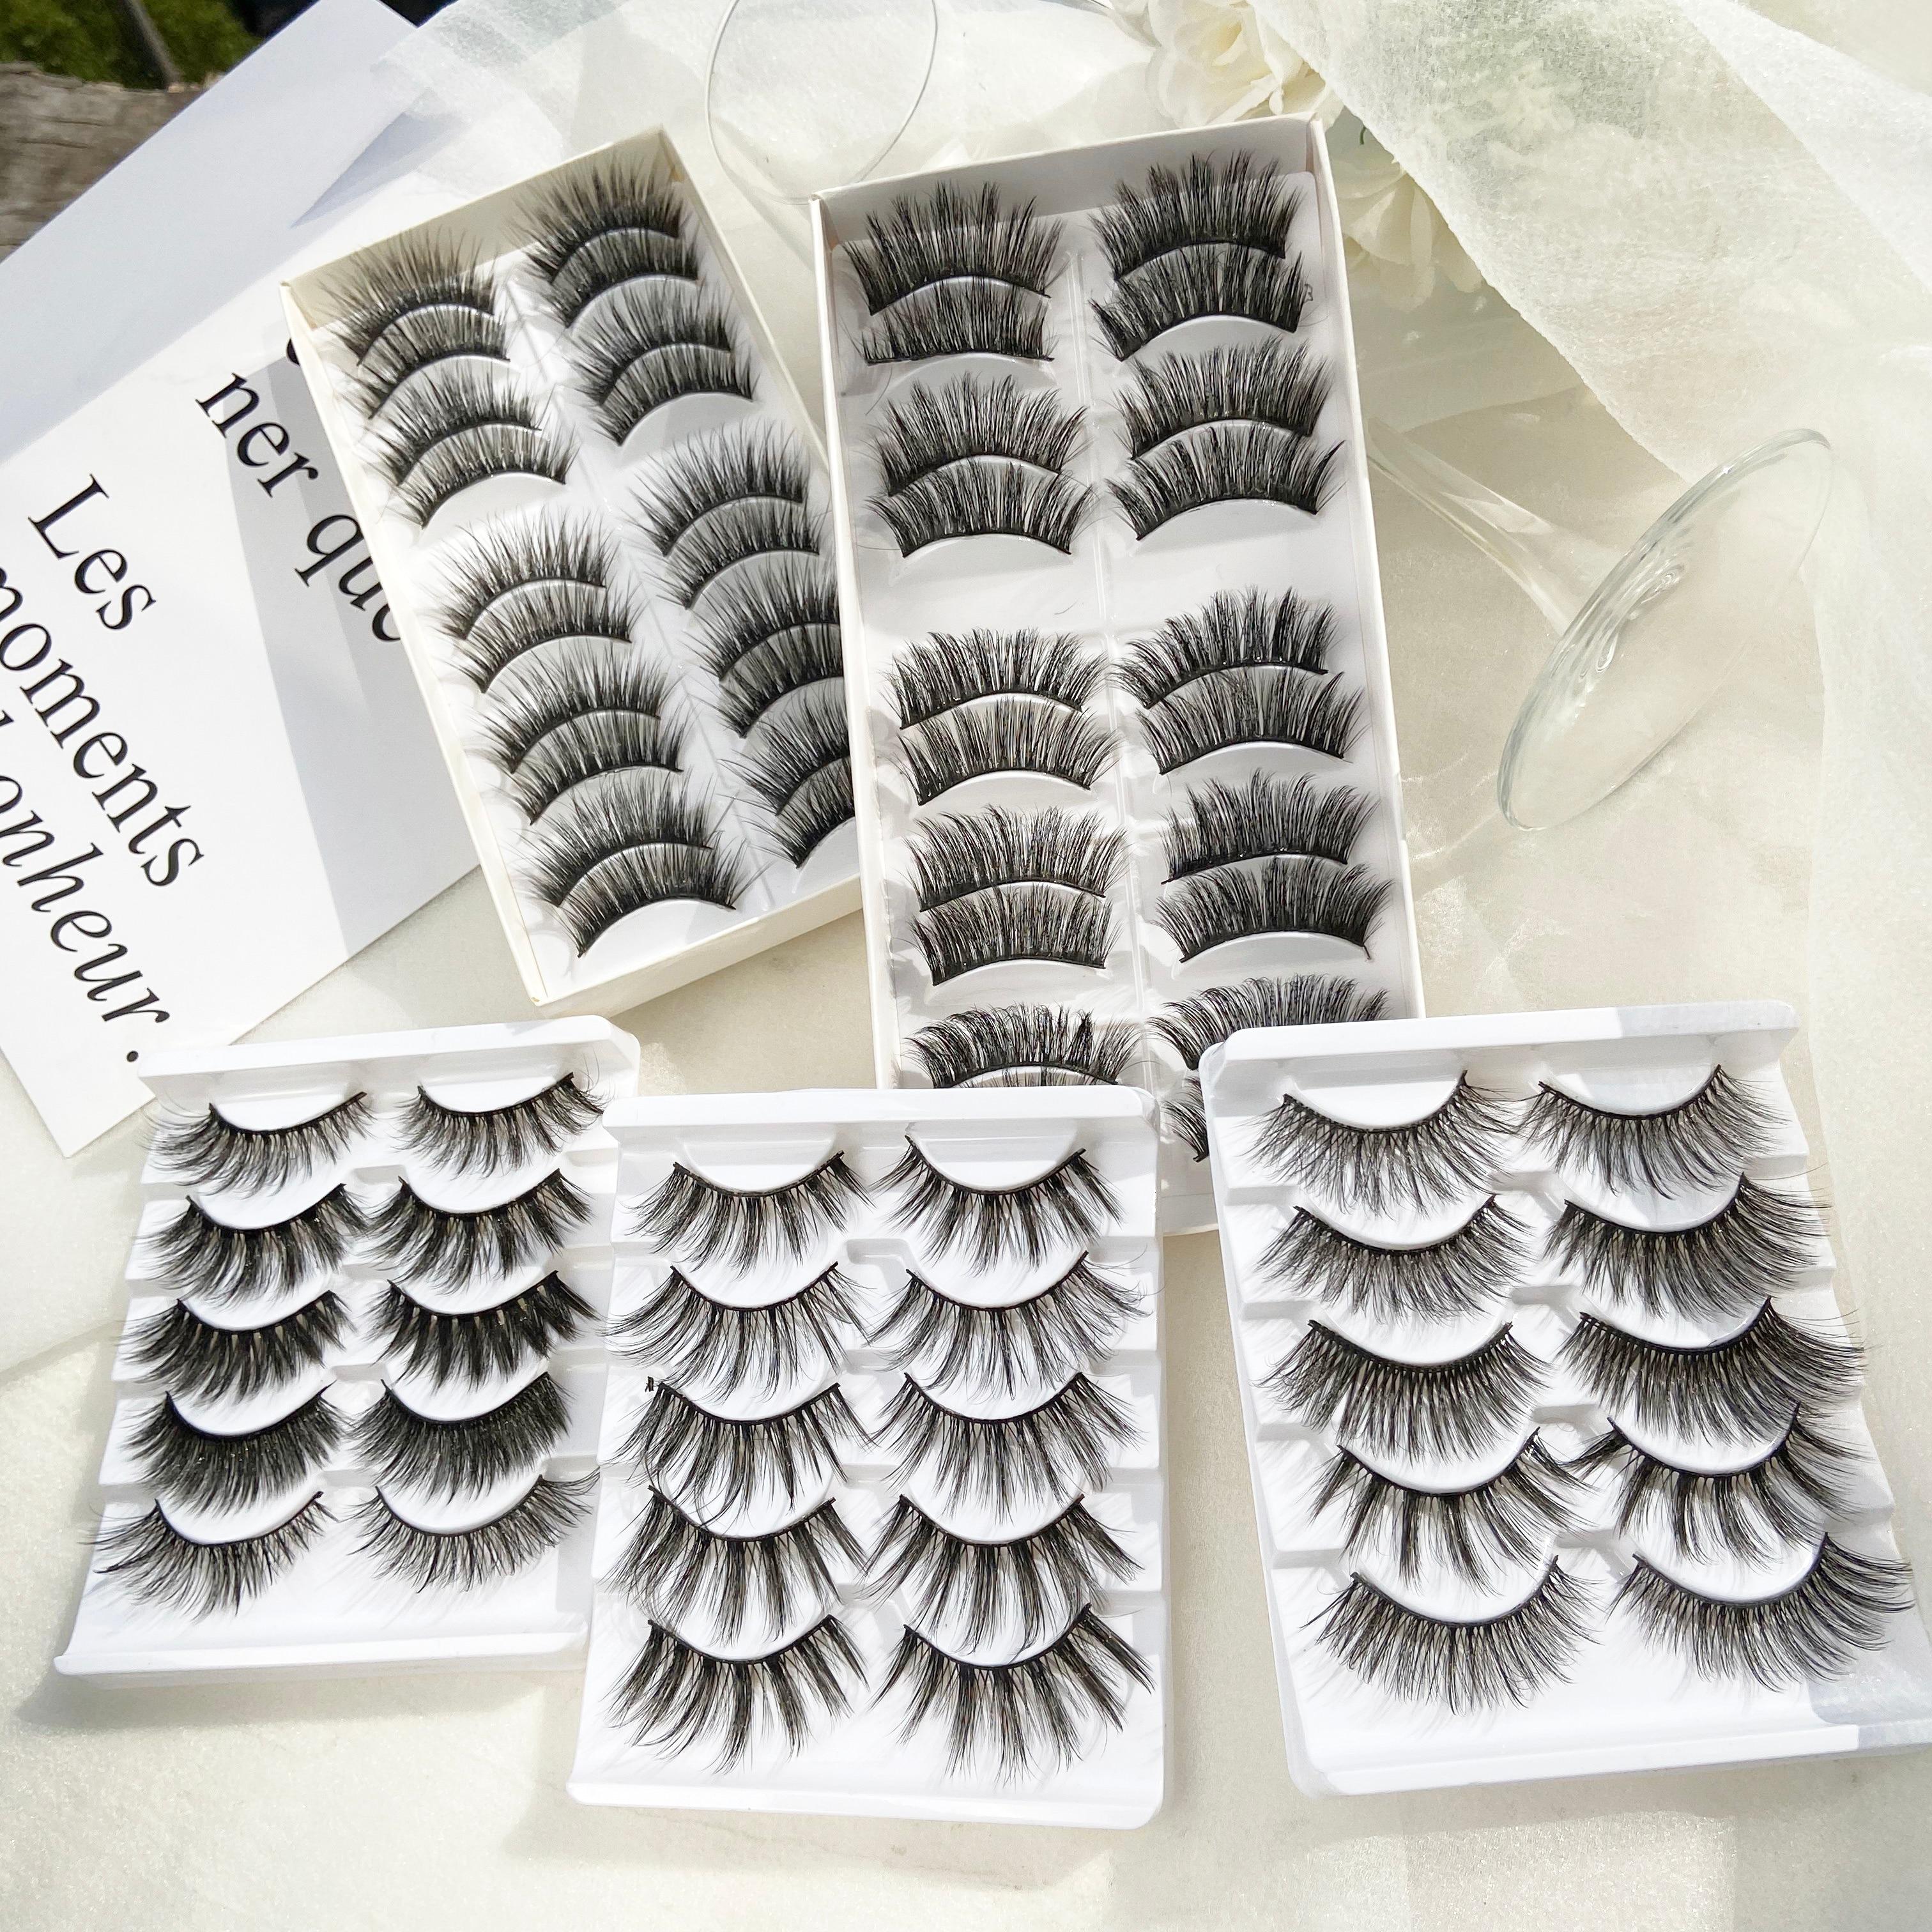 5/10 Pairs Thick 3D Mink Eye Lashes For Woman Drop Shipping Black 15-25mm Long Eyelash Cheap False Eyelashes 2020 New Lashes